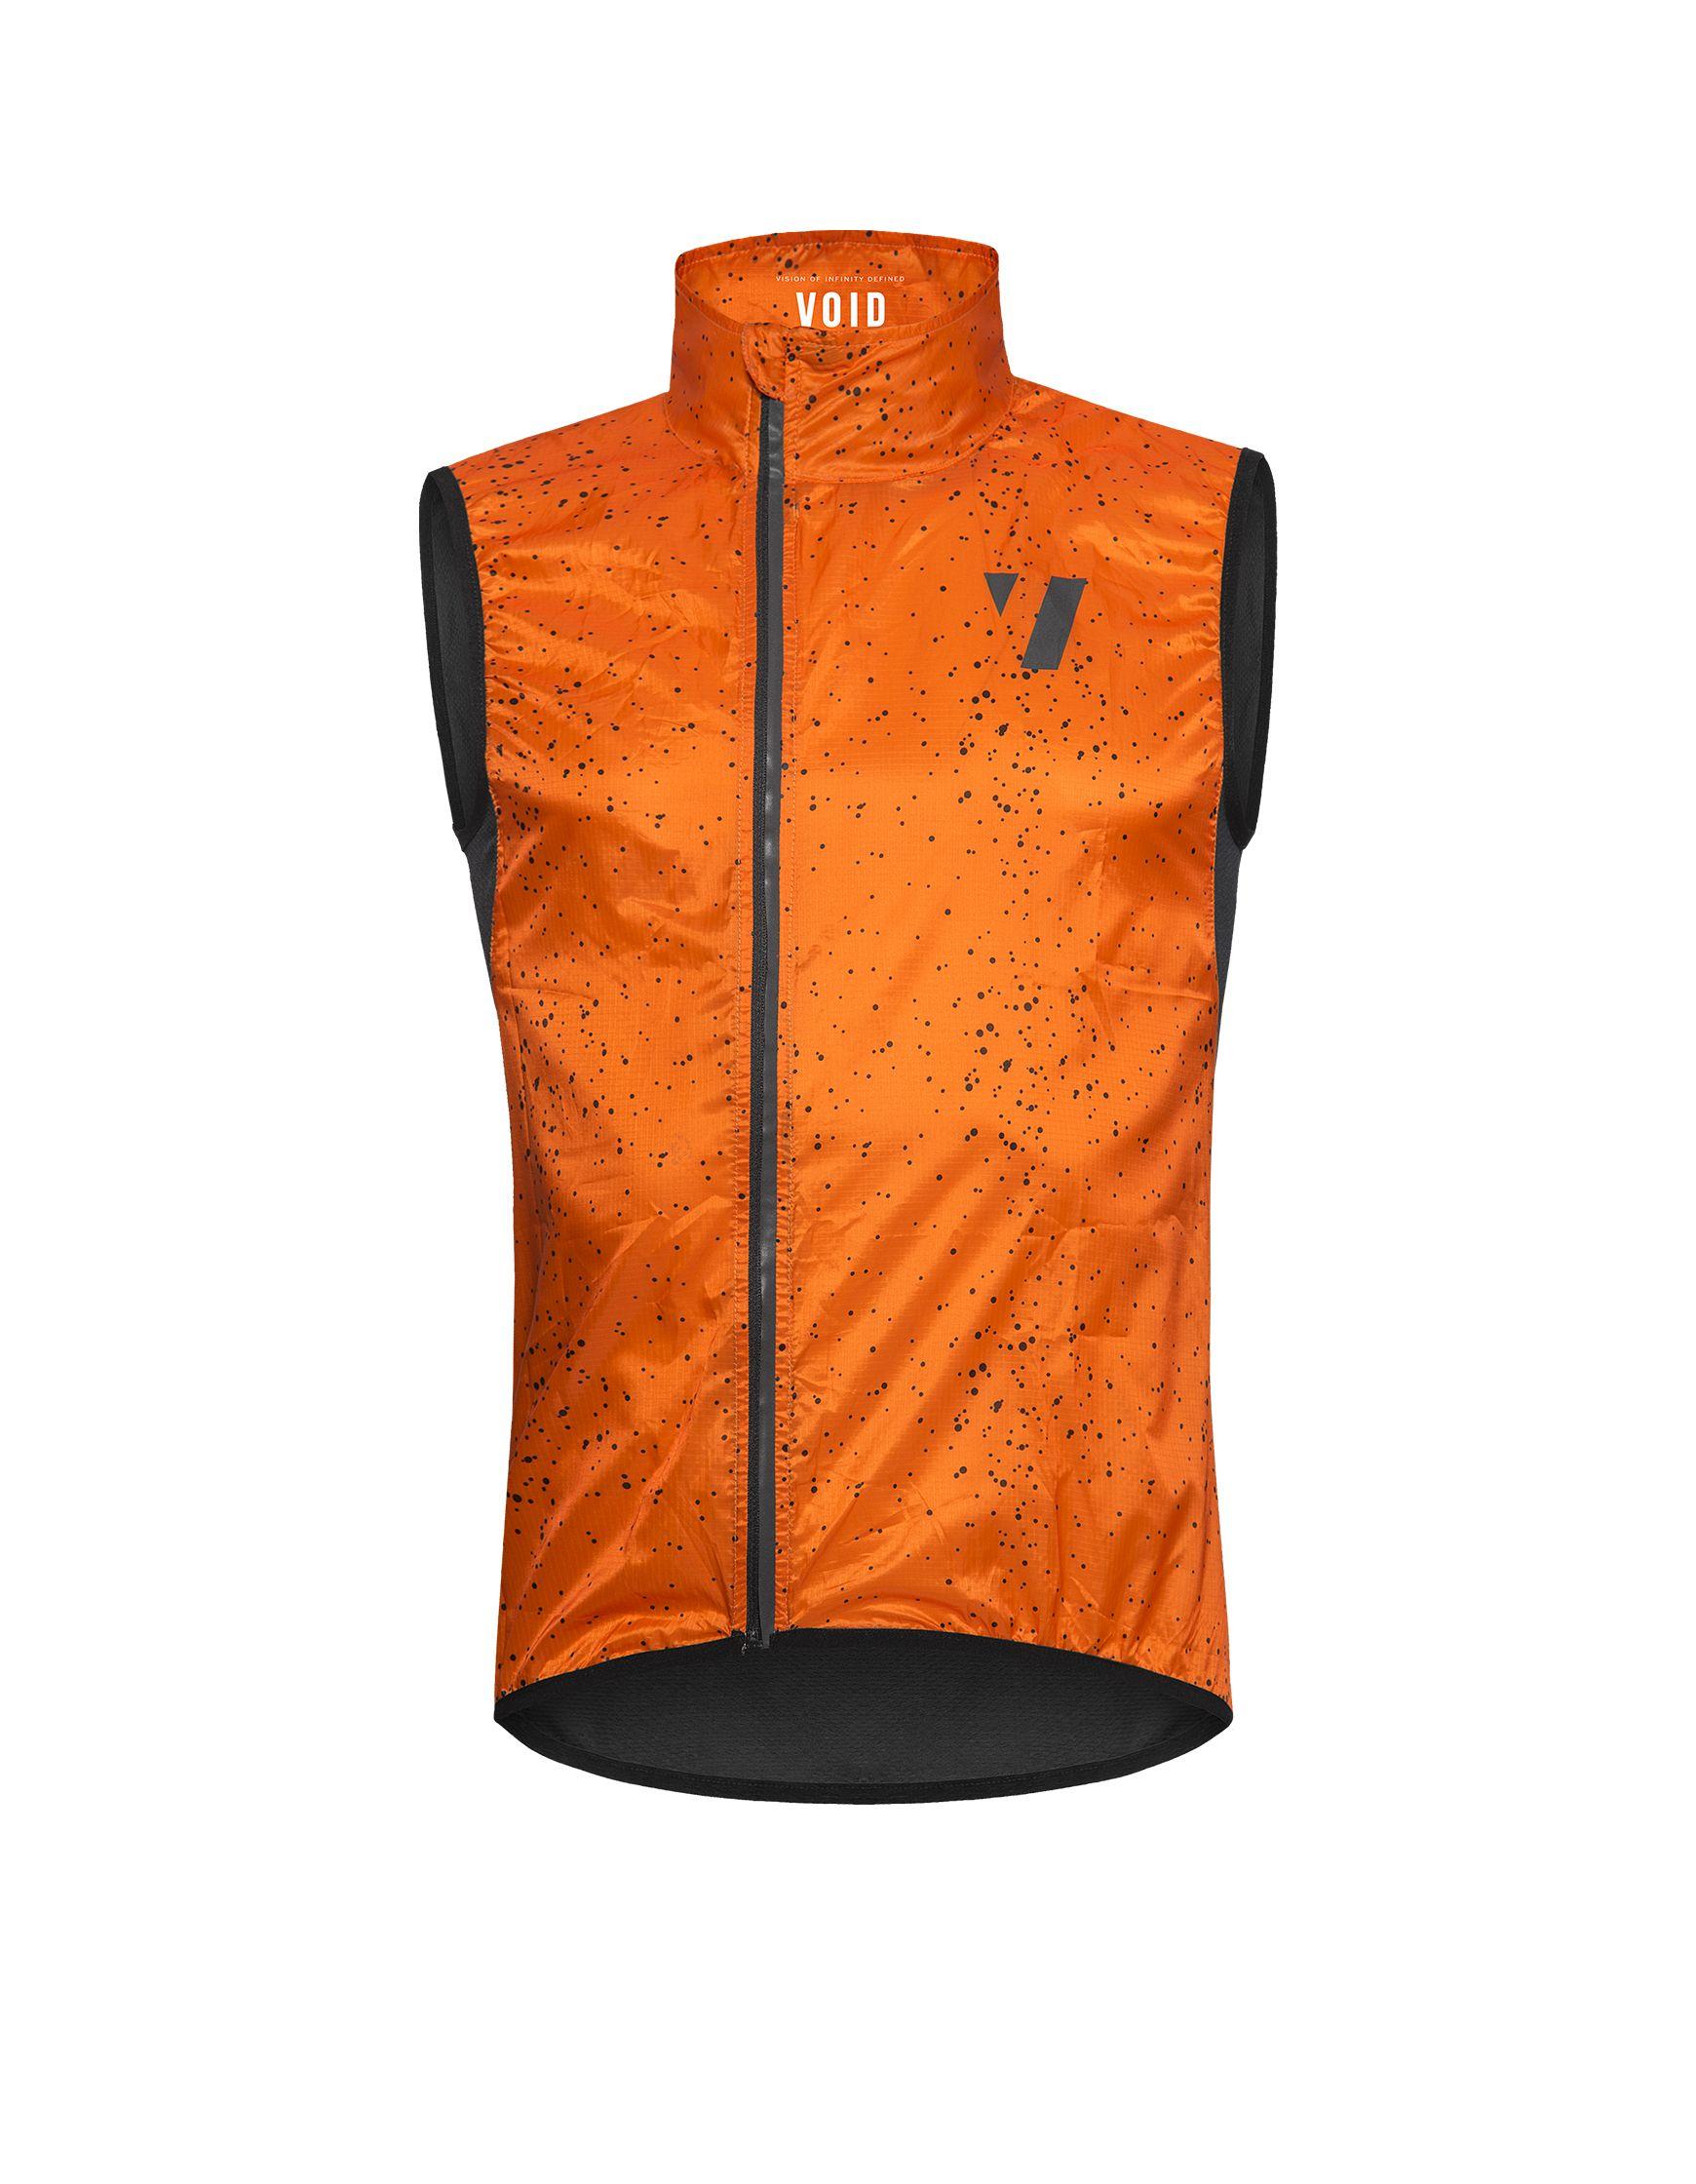 wind-vest-orange-spray-1